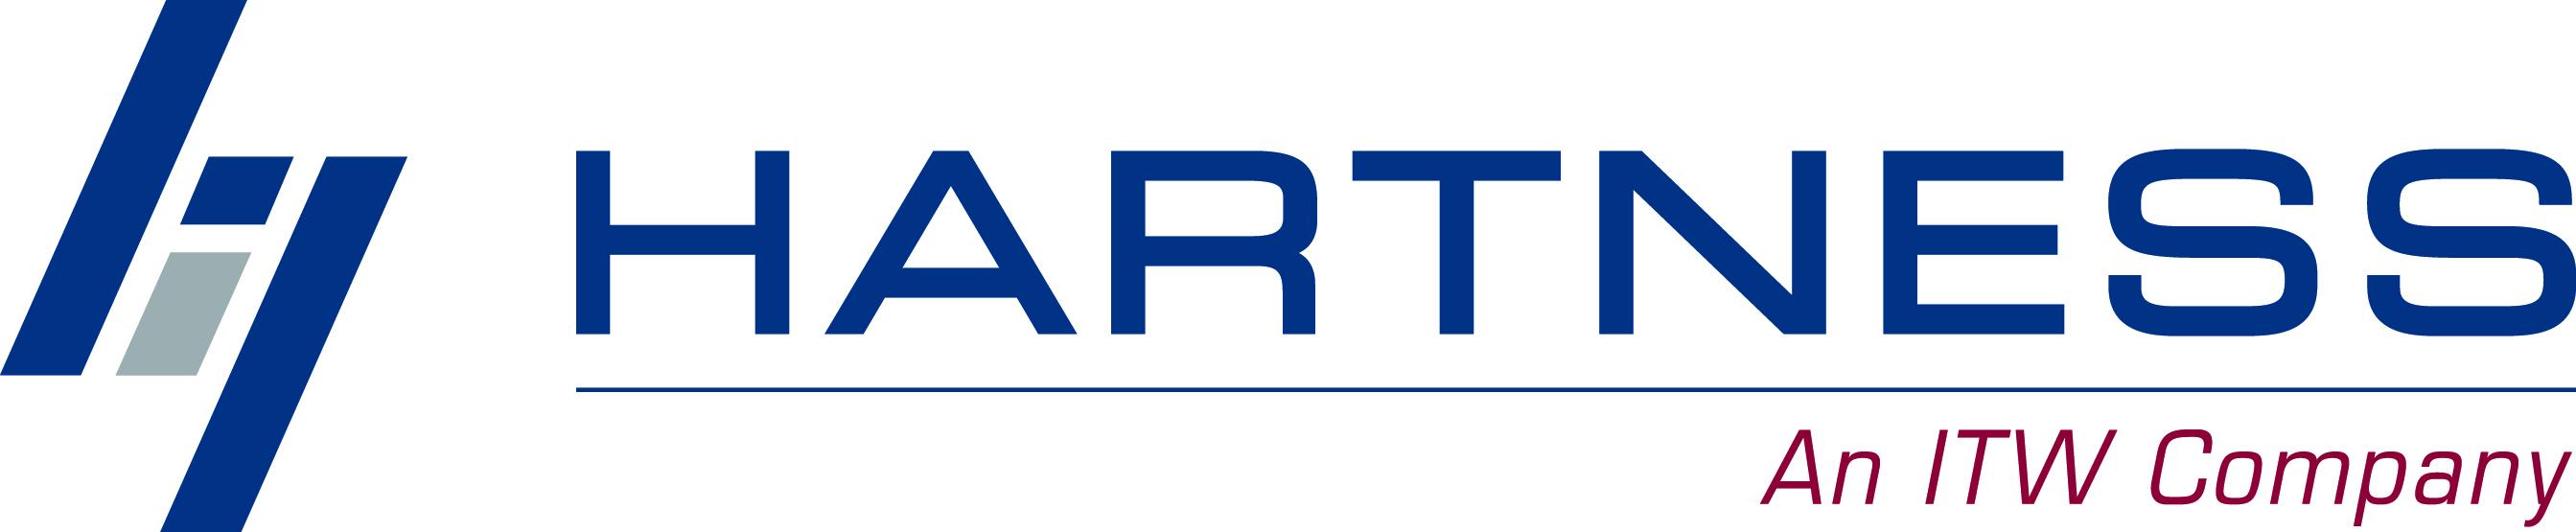 Hartness, An ITW Company